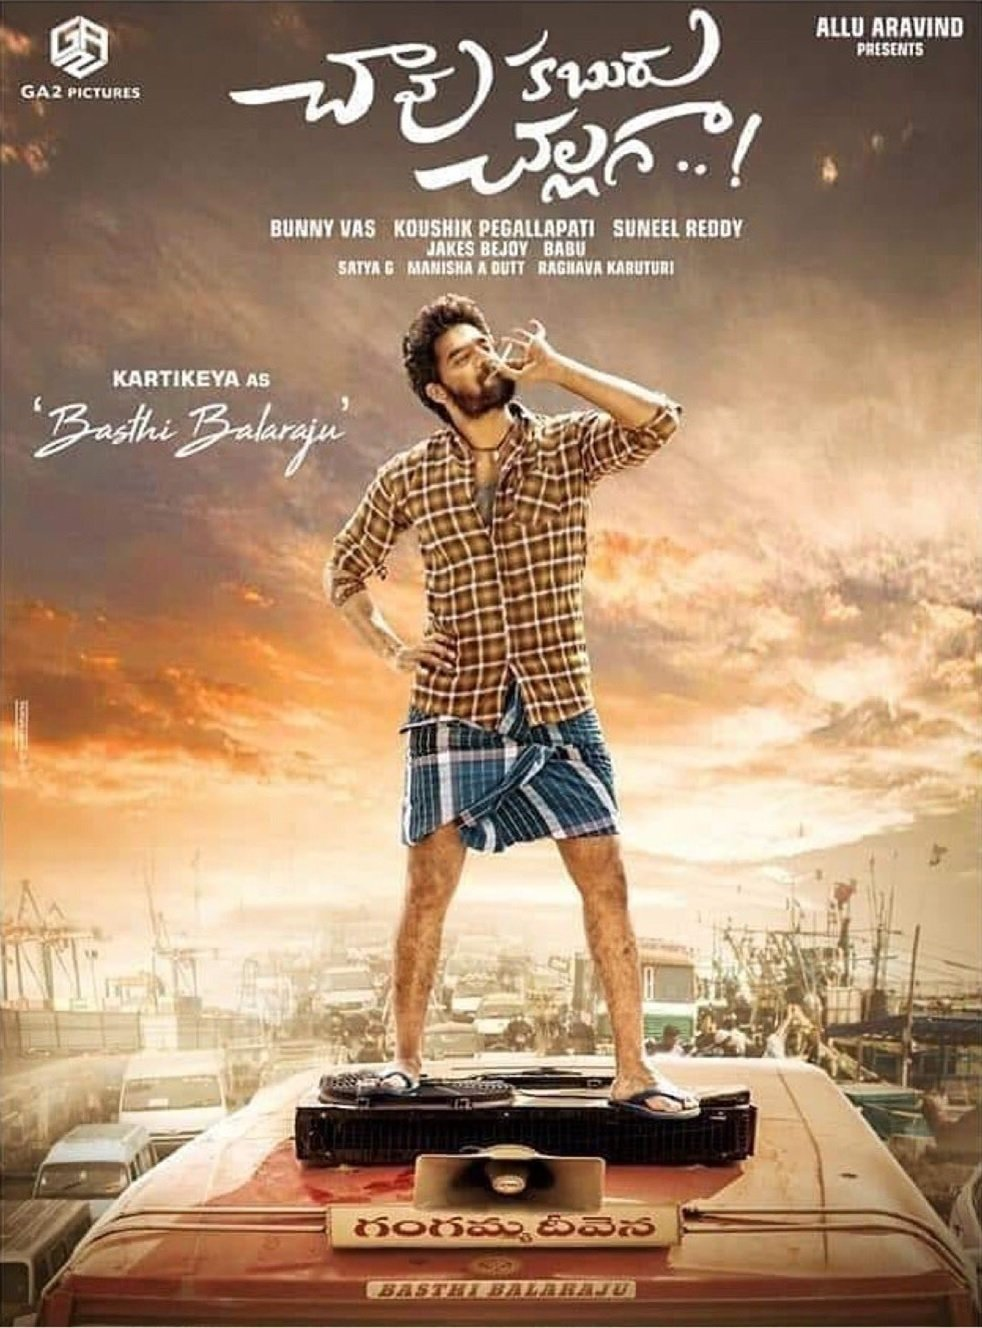 Telugu Kartikeya Chaavu Kaburu Challaga, Kartikeya In 90 Ml, Kartikeya New Movie, Rx 100 Hero Stills, Rx 100 Payal Rajput-Latest News English-Telugu Tollywood News Photos Pics